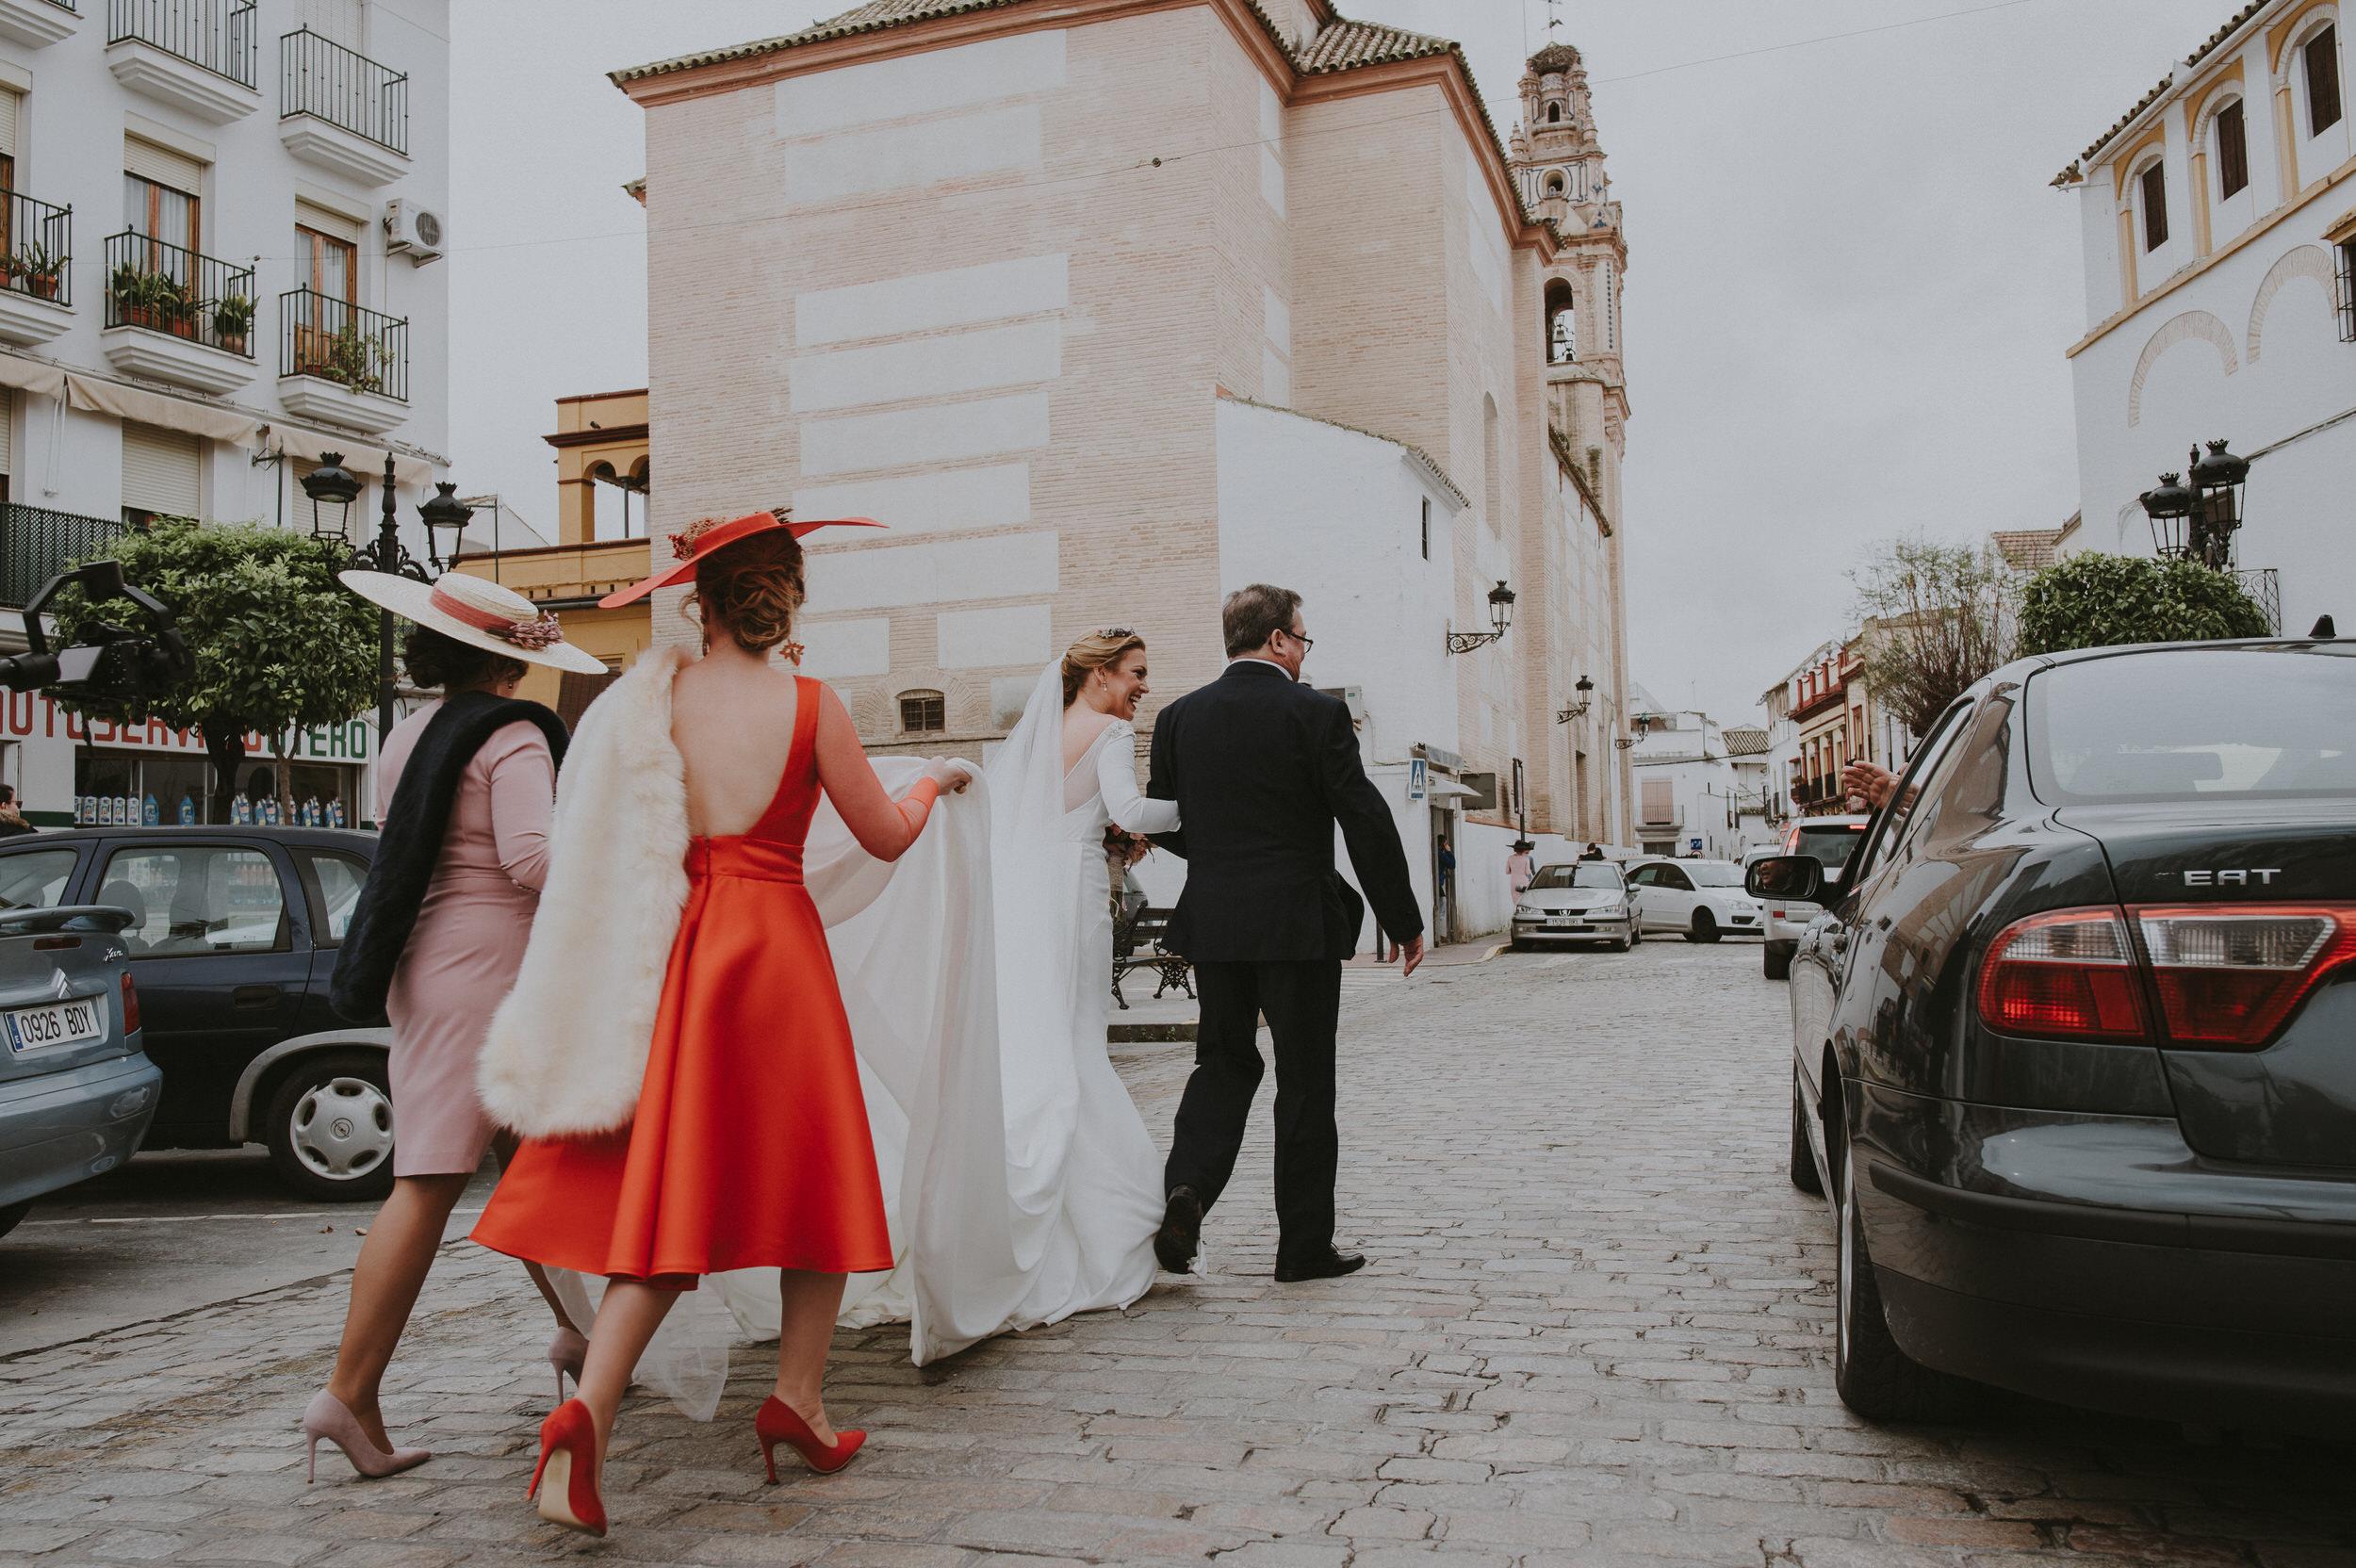 Cristina & Jero - Boda en Ecija - Iglesia Santa Ana - Fotógrafo Andrés Amarillo (20).JPG